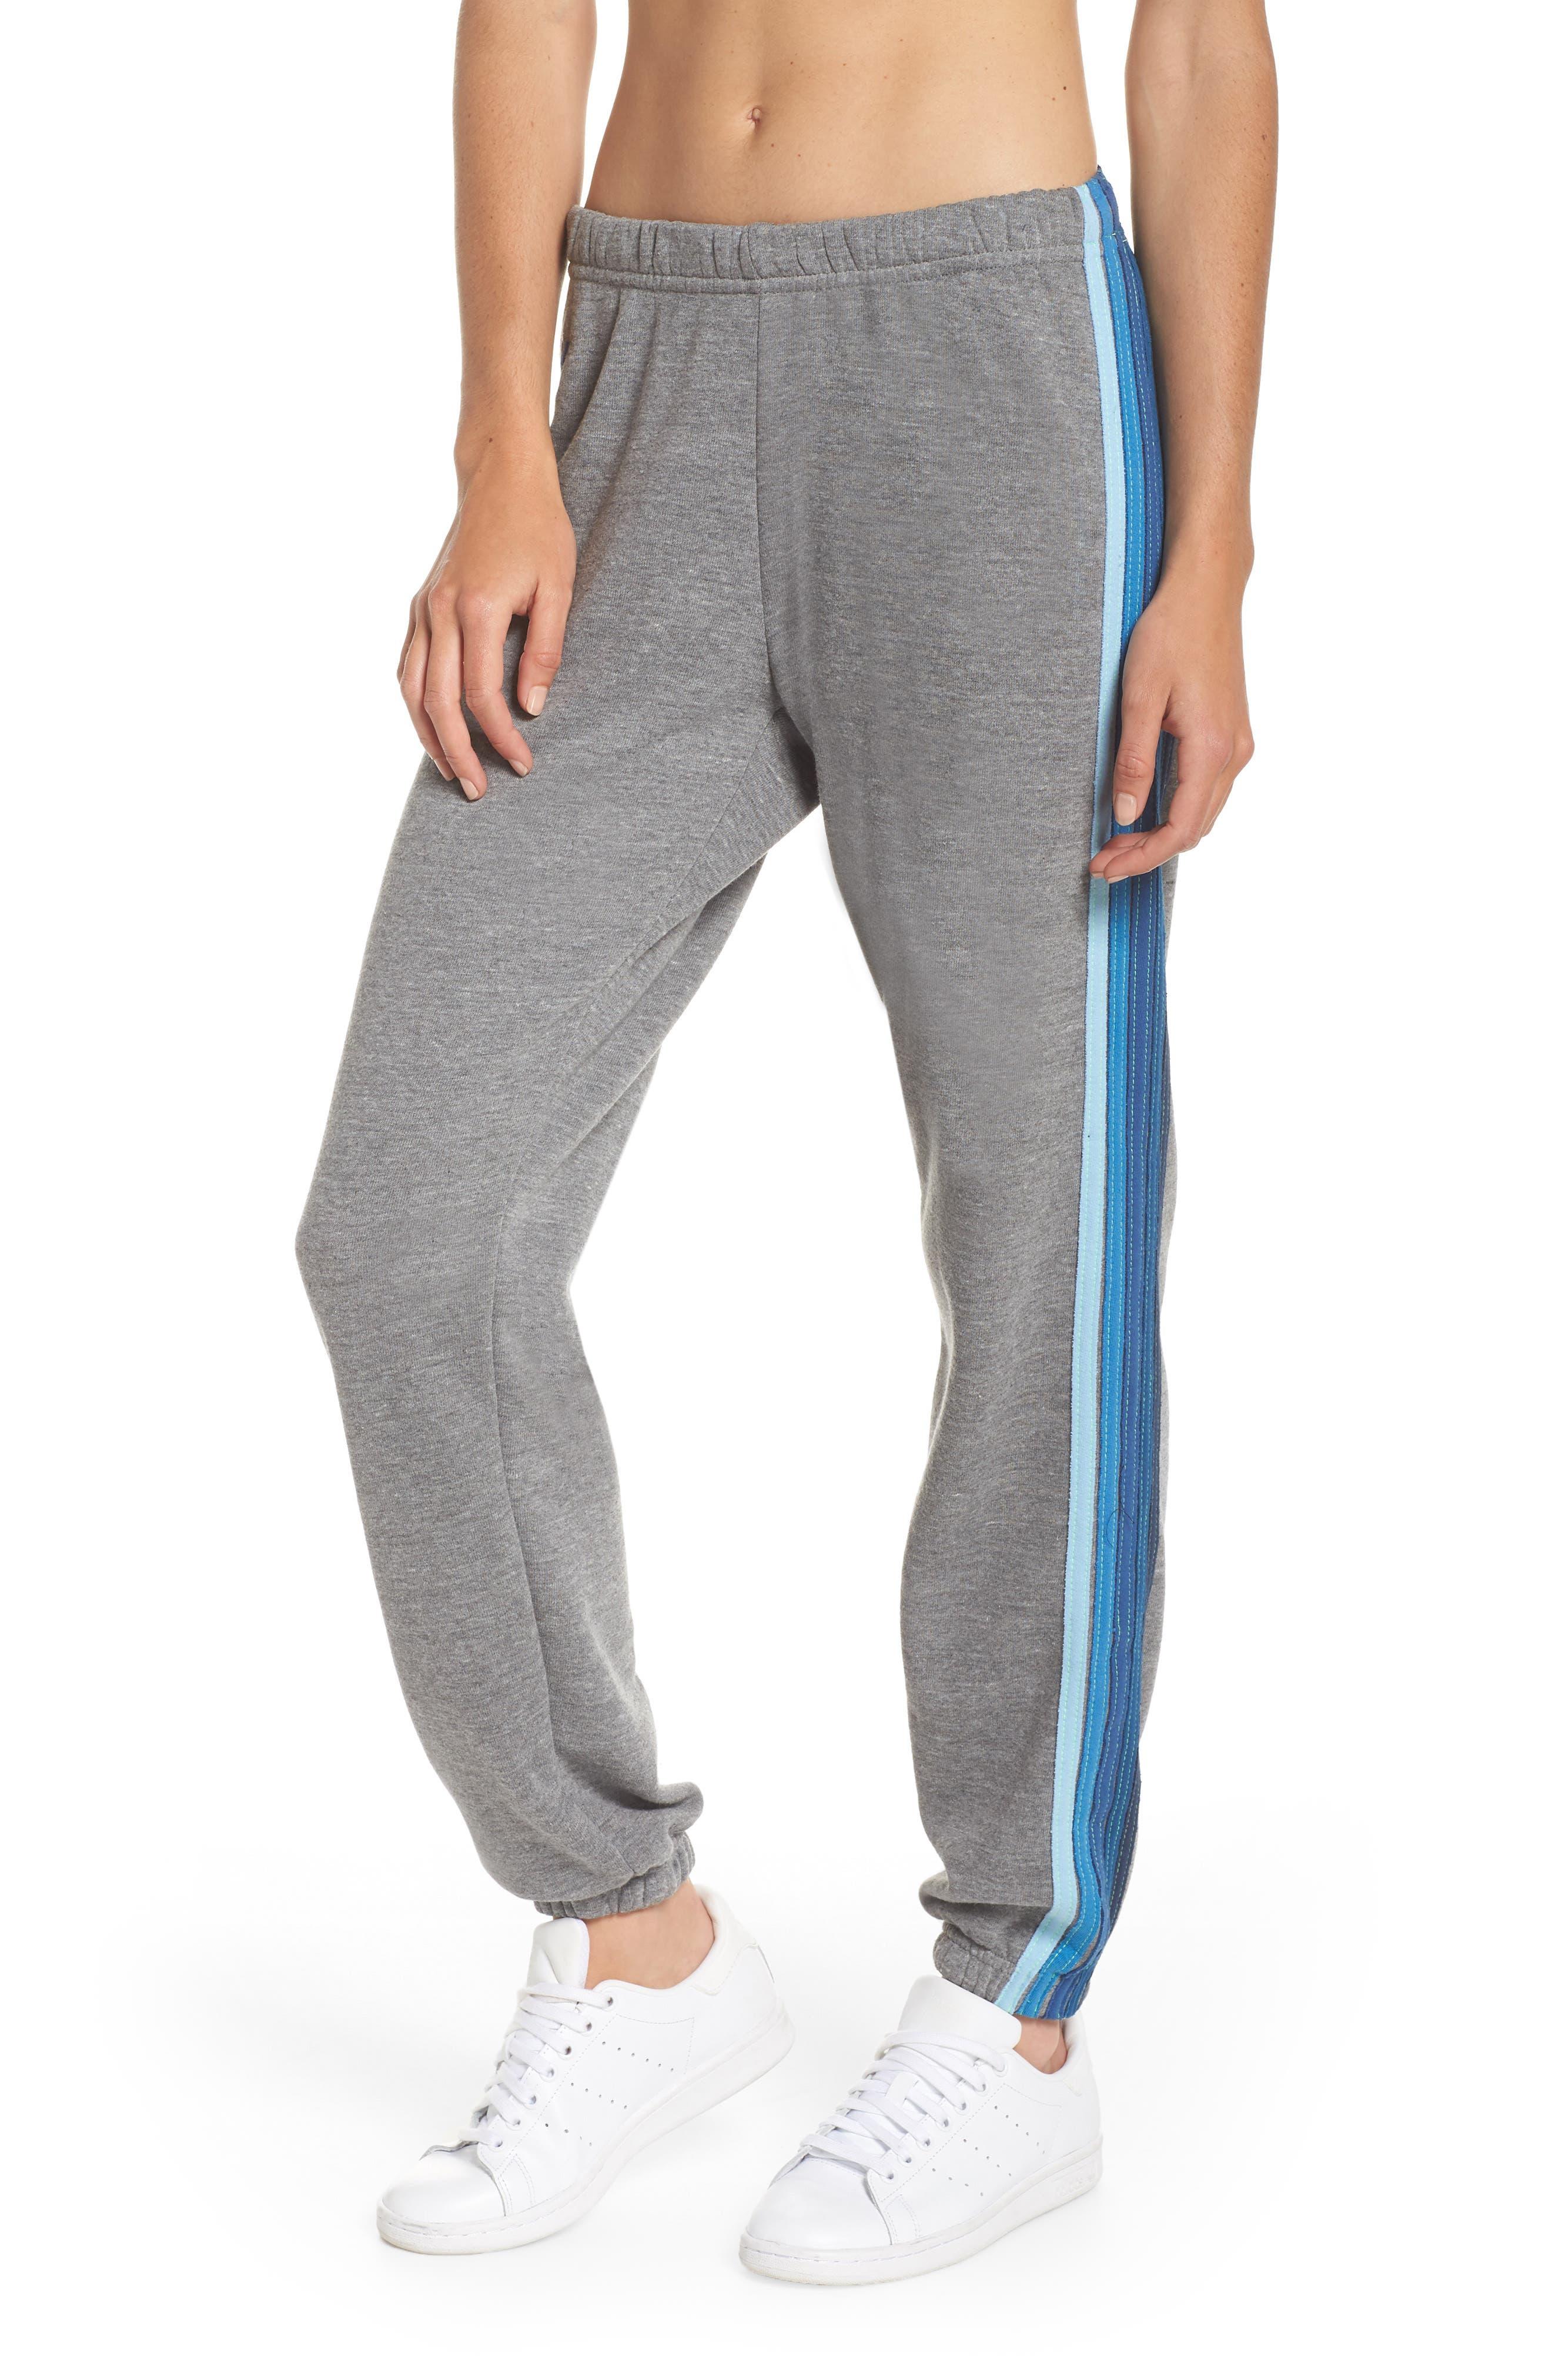 Stripe Sweatpants,                         Main,                         color, Heather Grey/ Blue Stripes